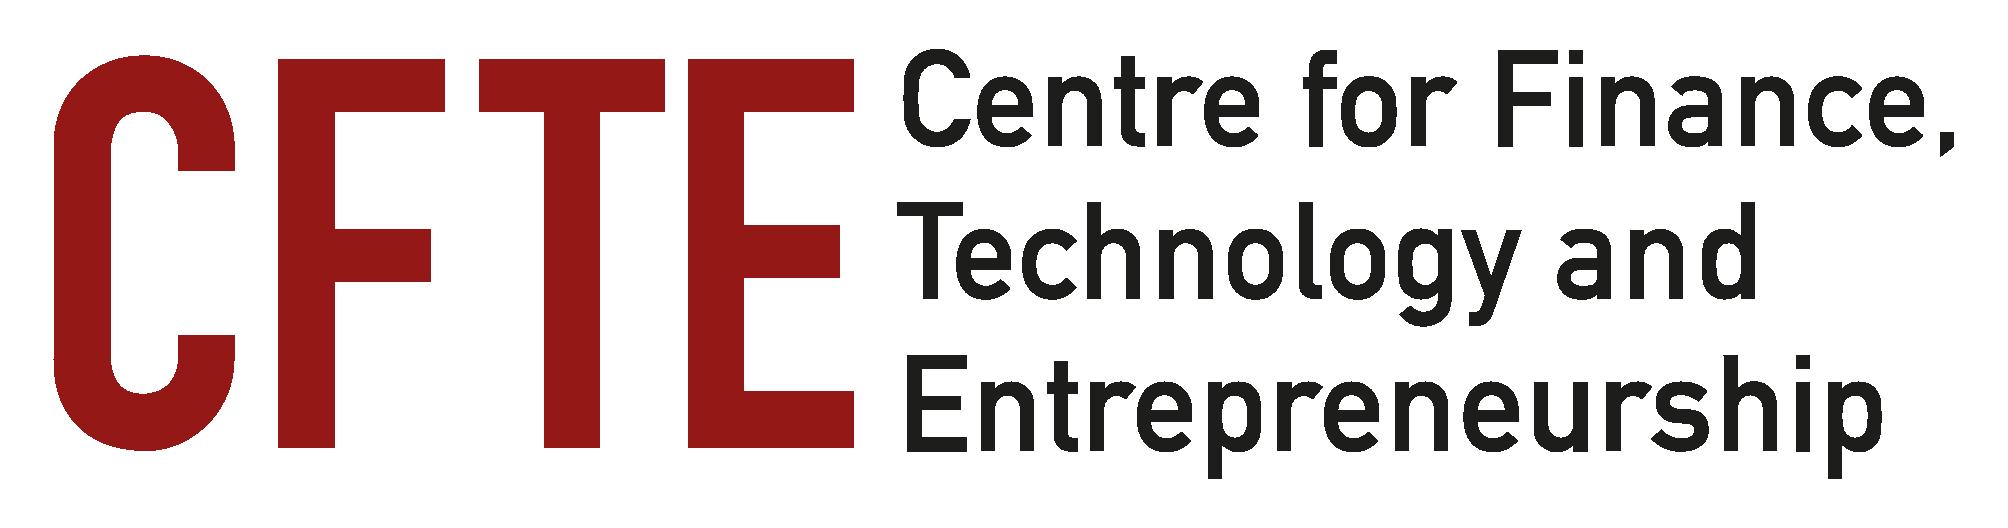 CFTE Online Campus